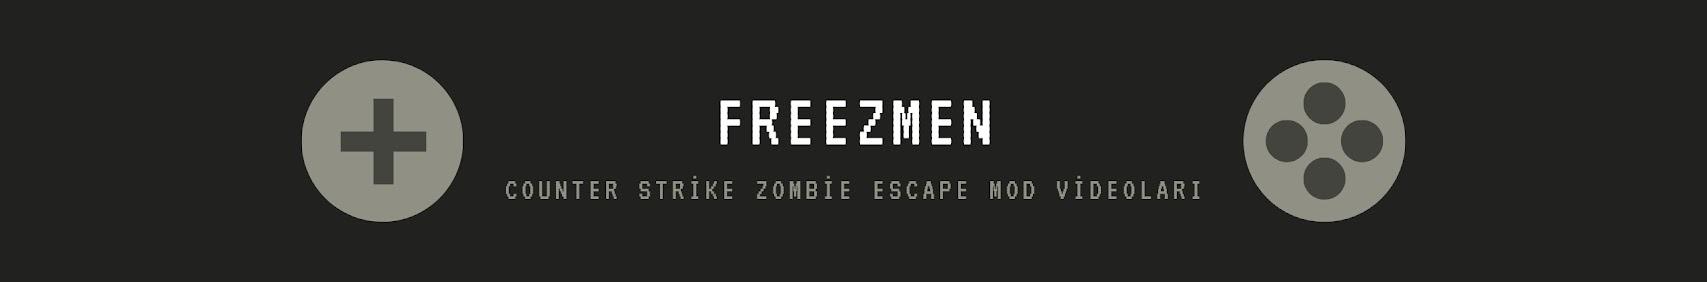 Freezmen counter-strike zombie, counter strike, cs go, counter strike zombie assault, counter strike assault,  Freezmen,  YouTuber CMS